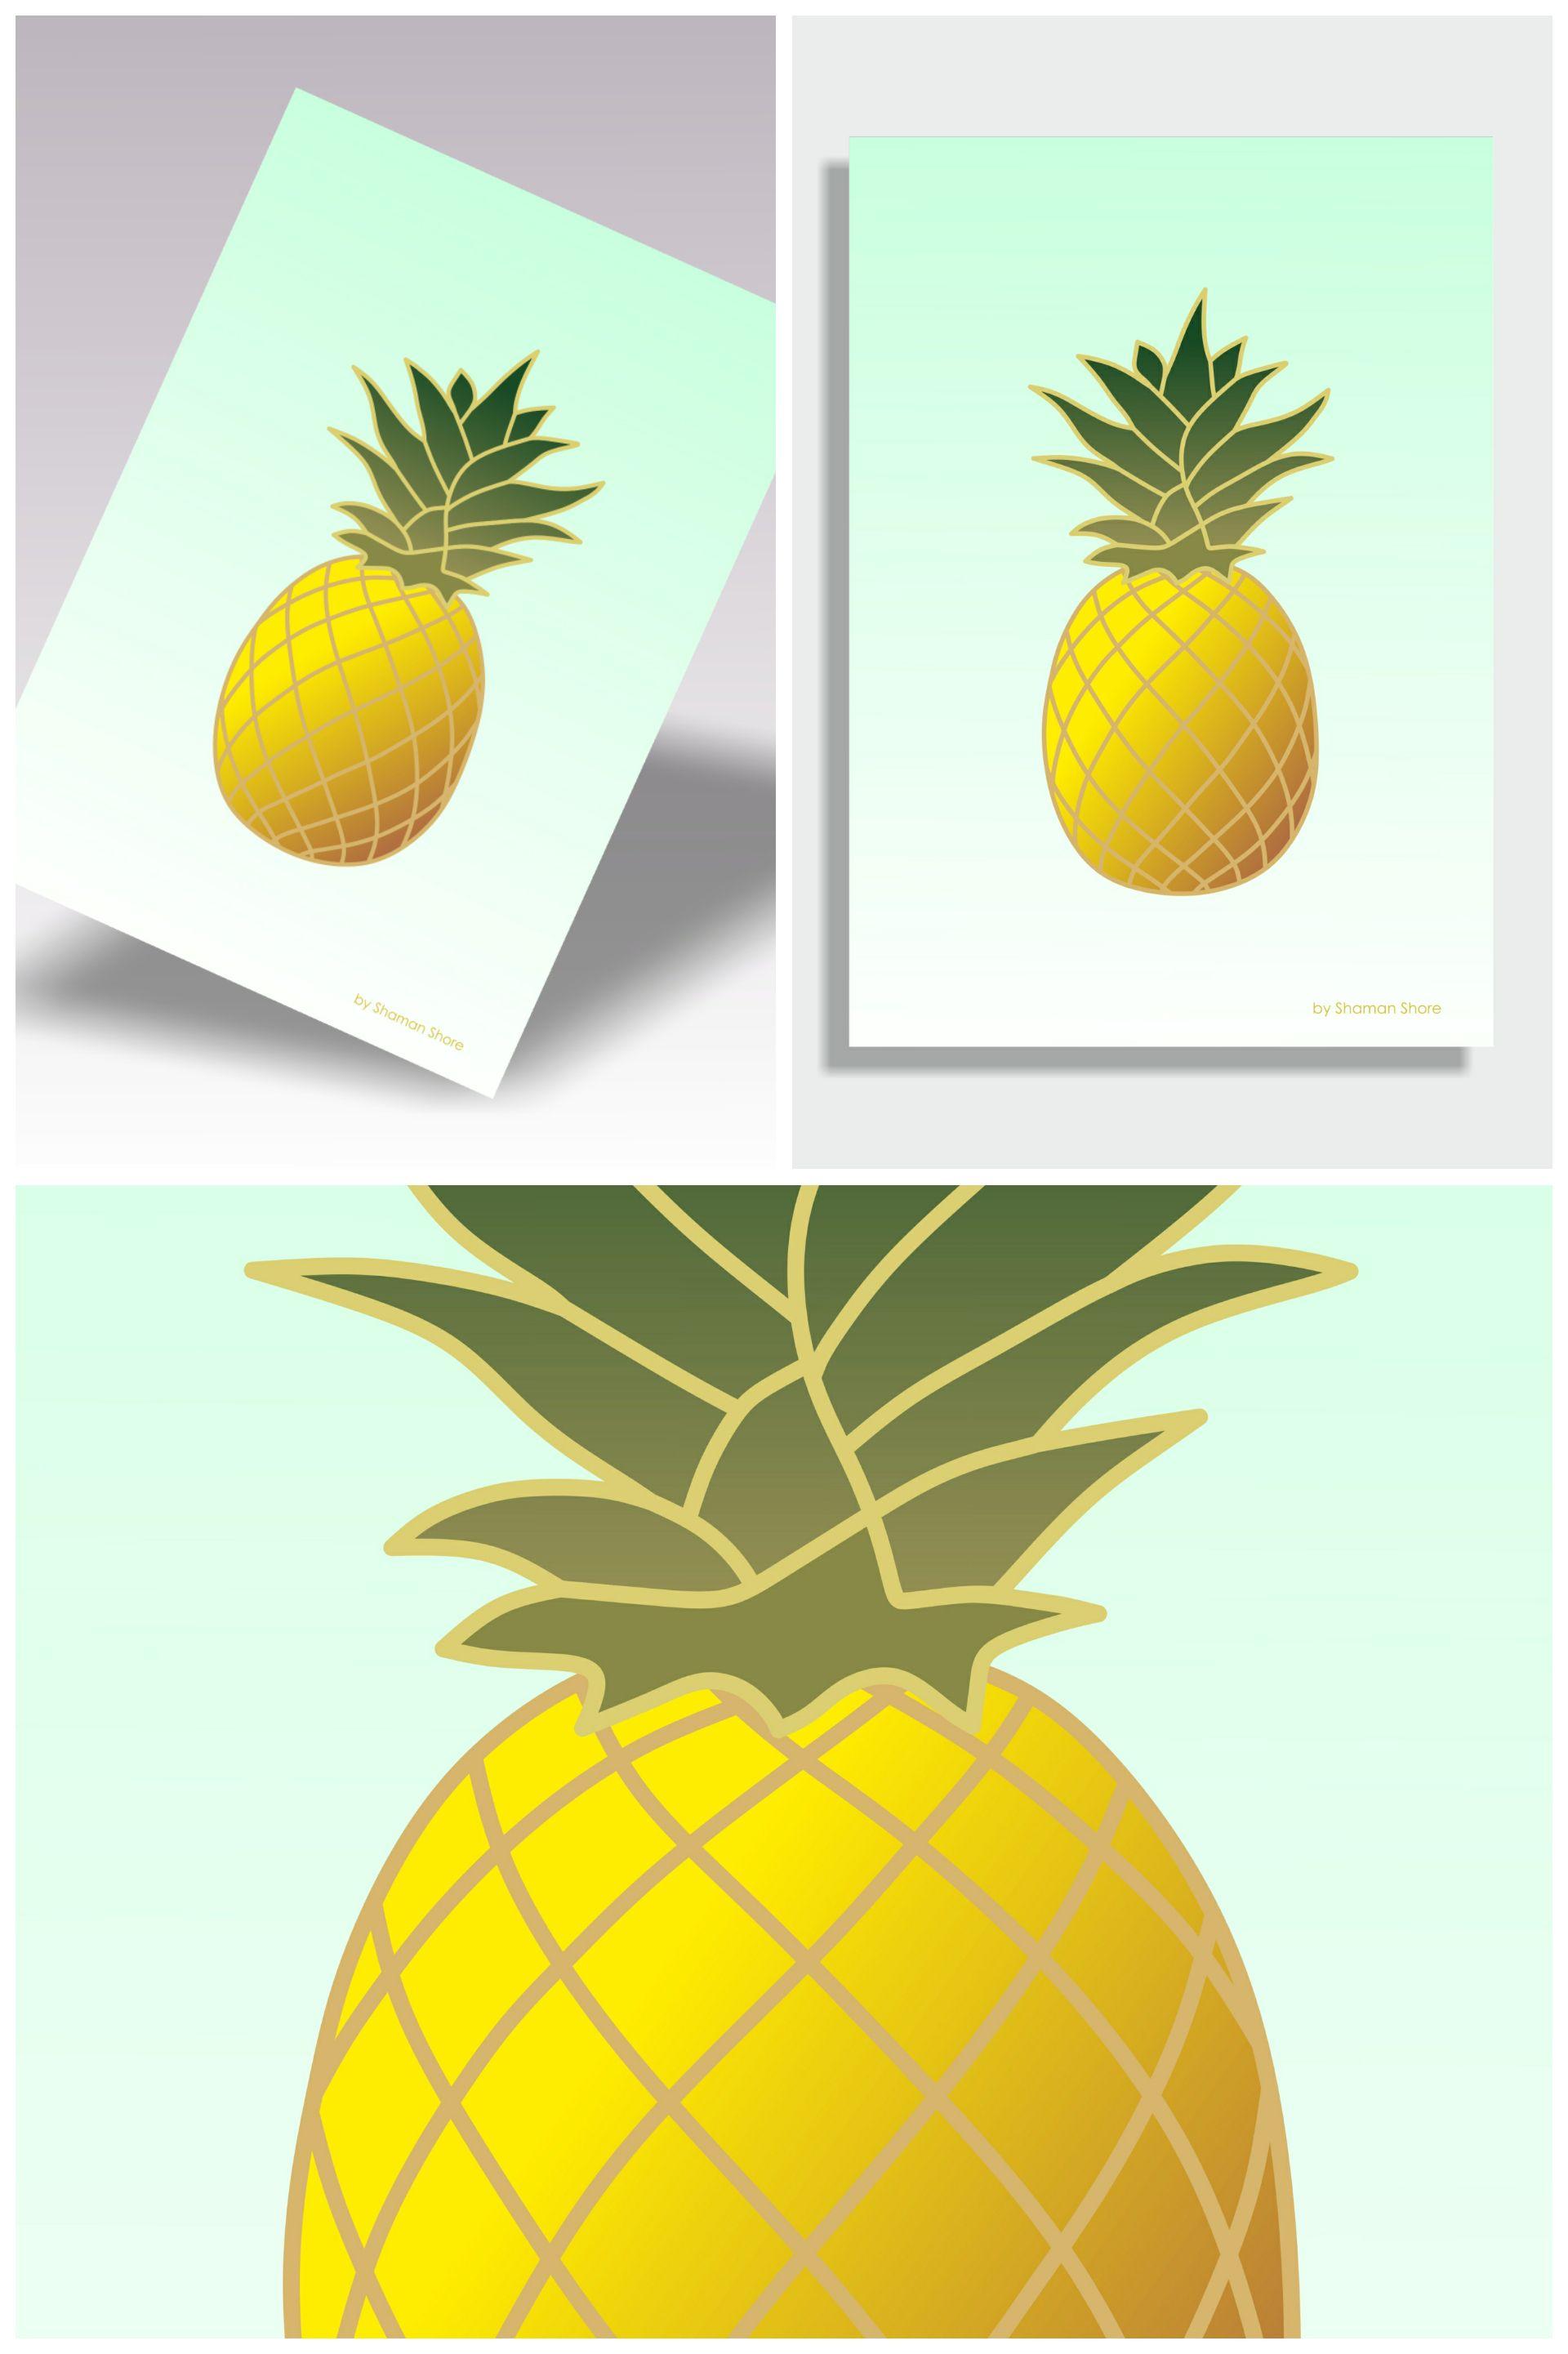 Pineapple Print, Pineapple Décor Wall Print, Pineapple Wall Art ...